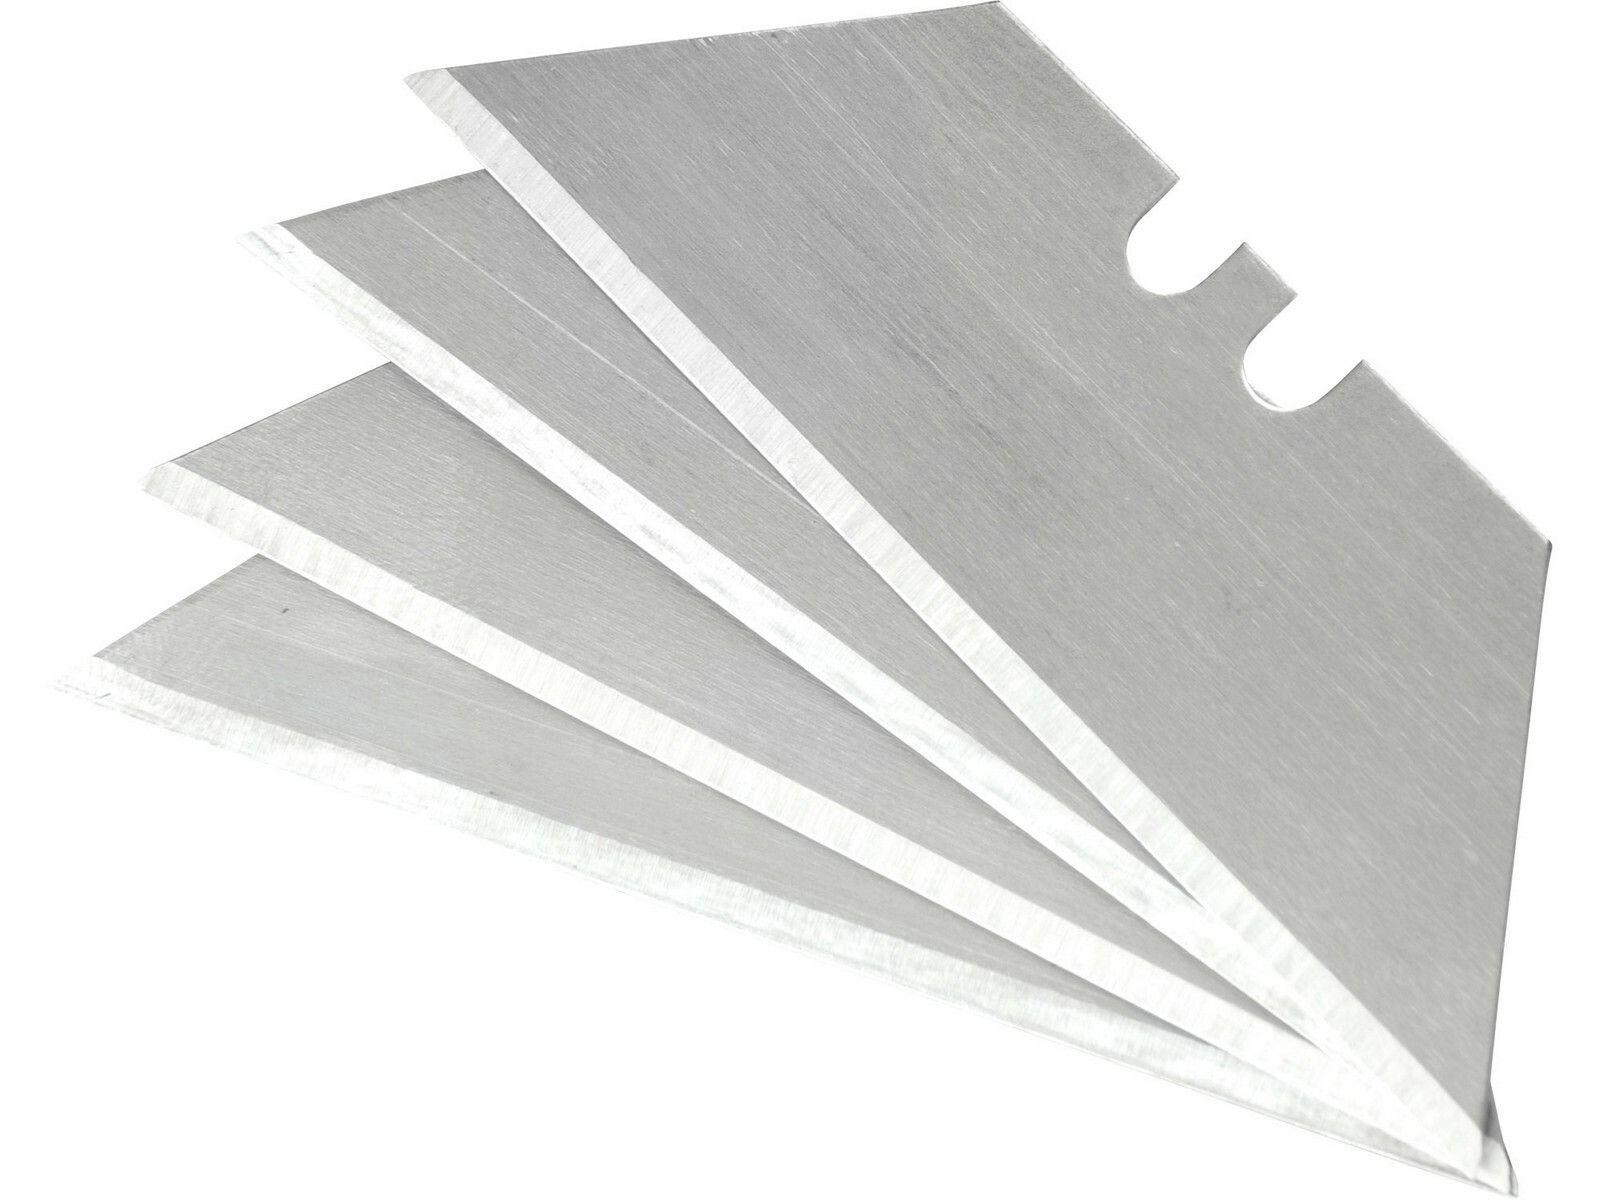 Břity do nože, 19mm, 10ks, trapezoid, SK4 EXTOL-PREMIUM